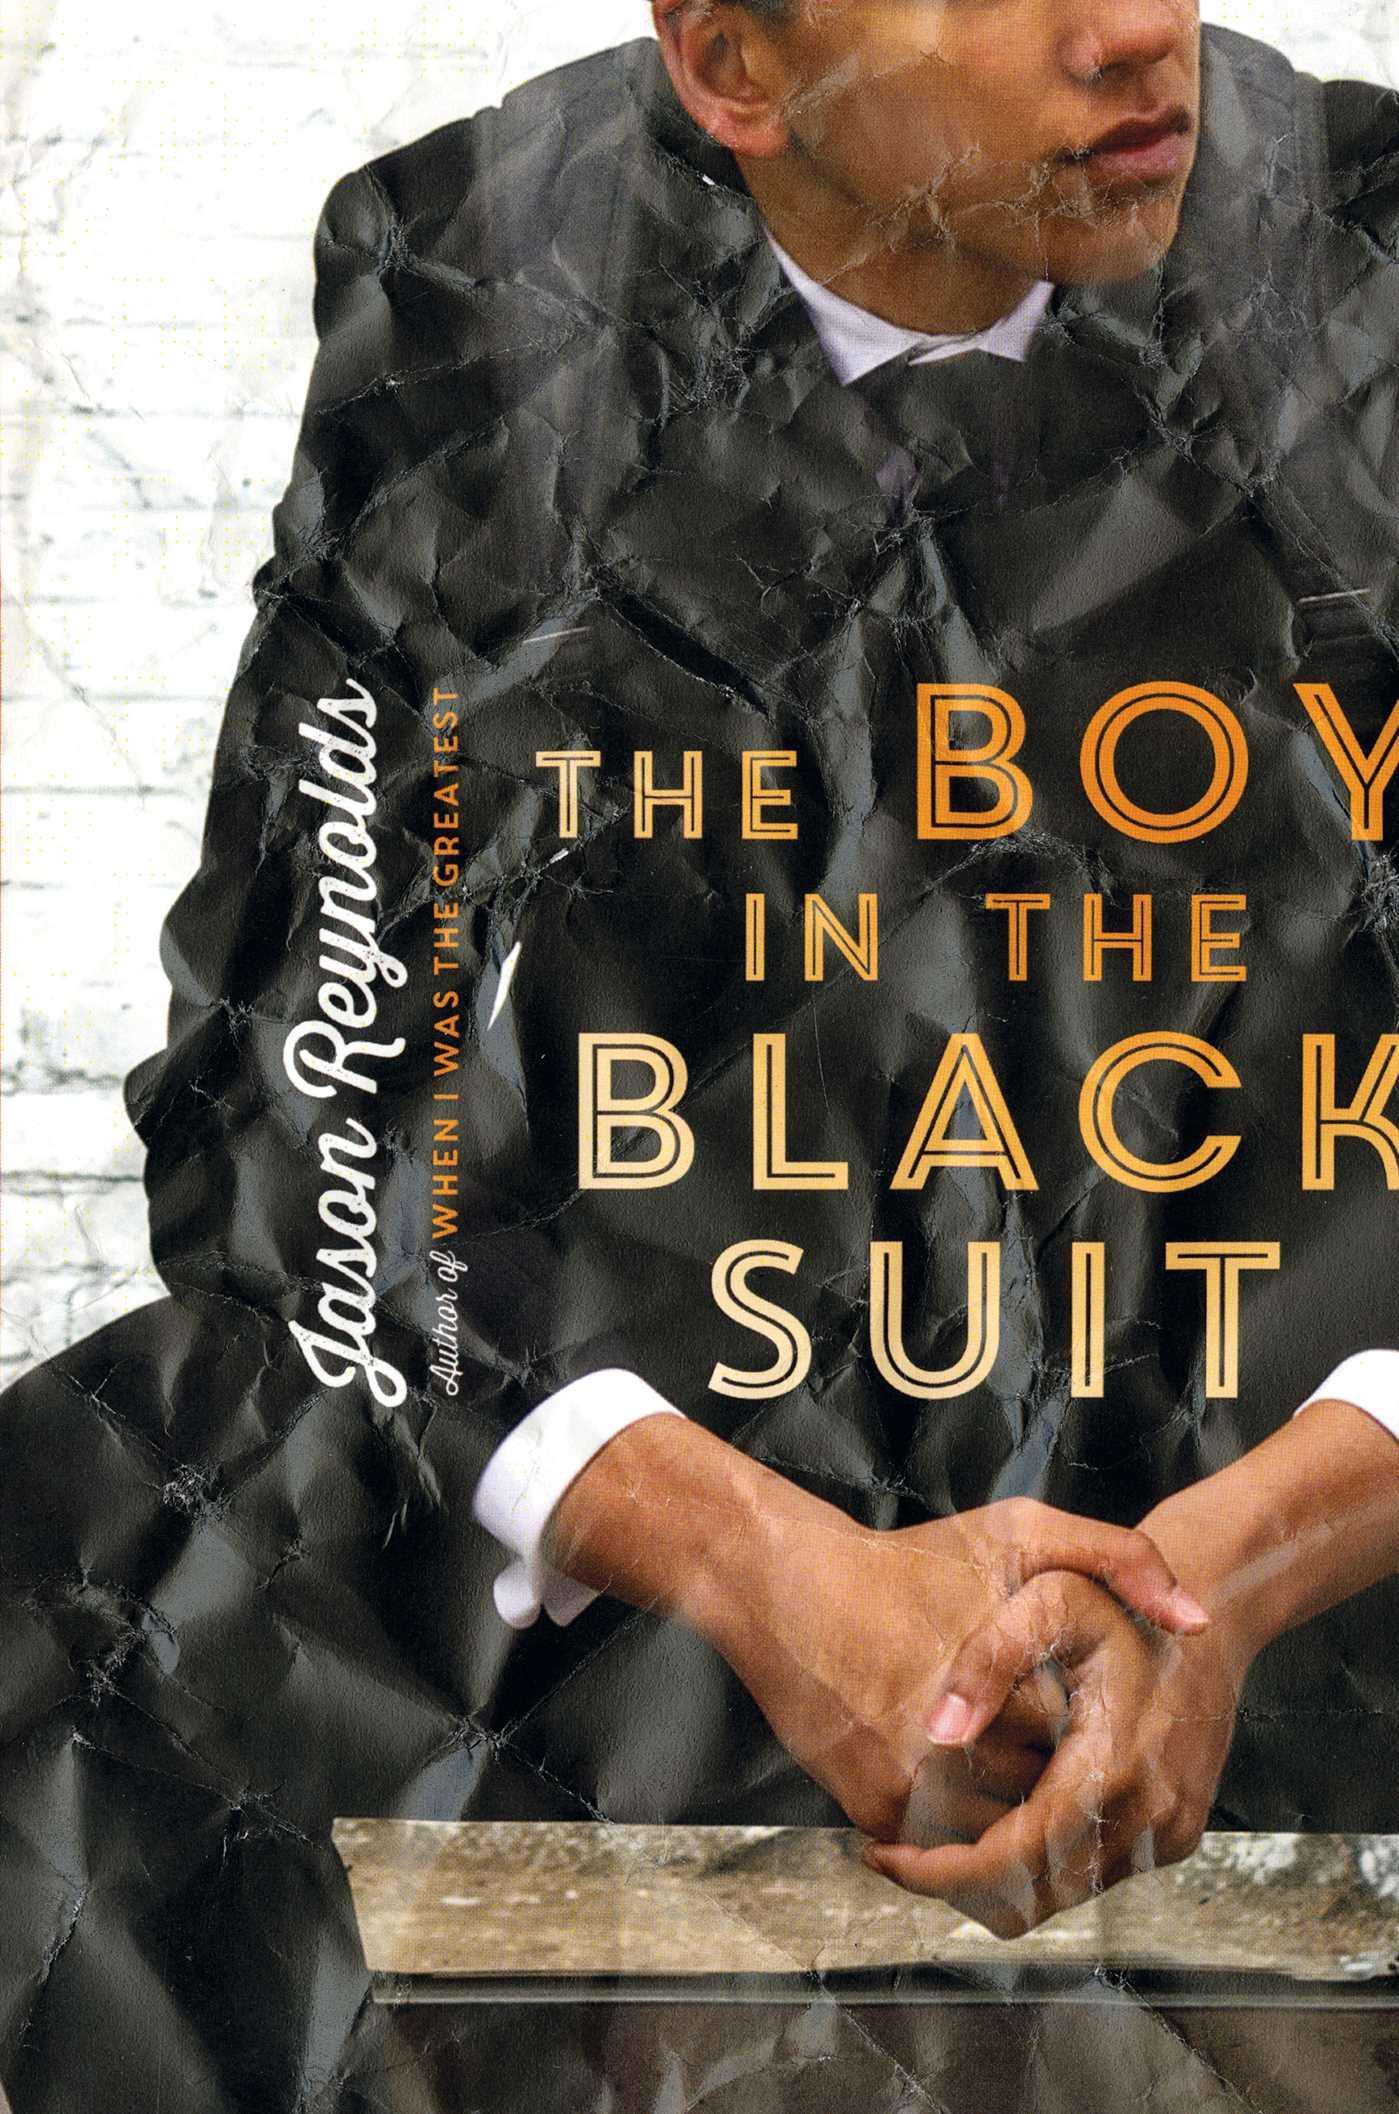 Boy-in-the-black-suit-9781442459502_hr